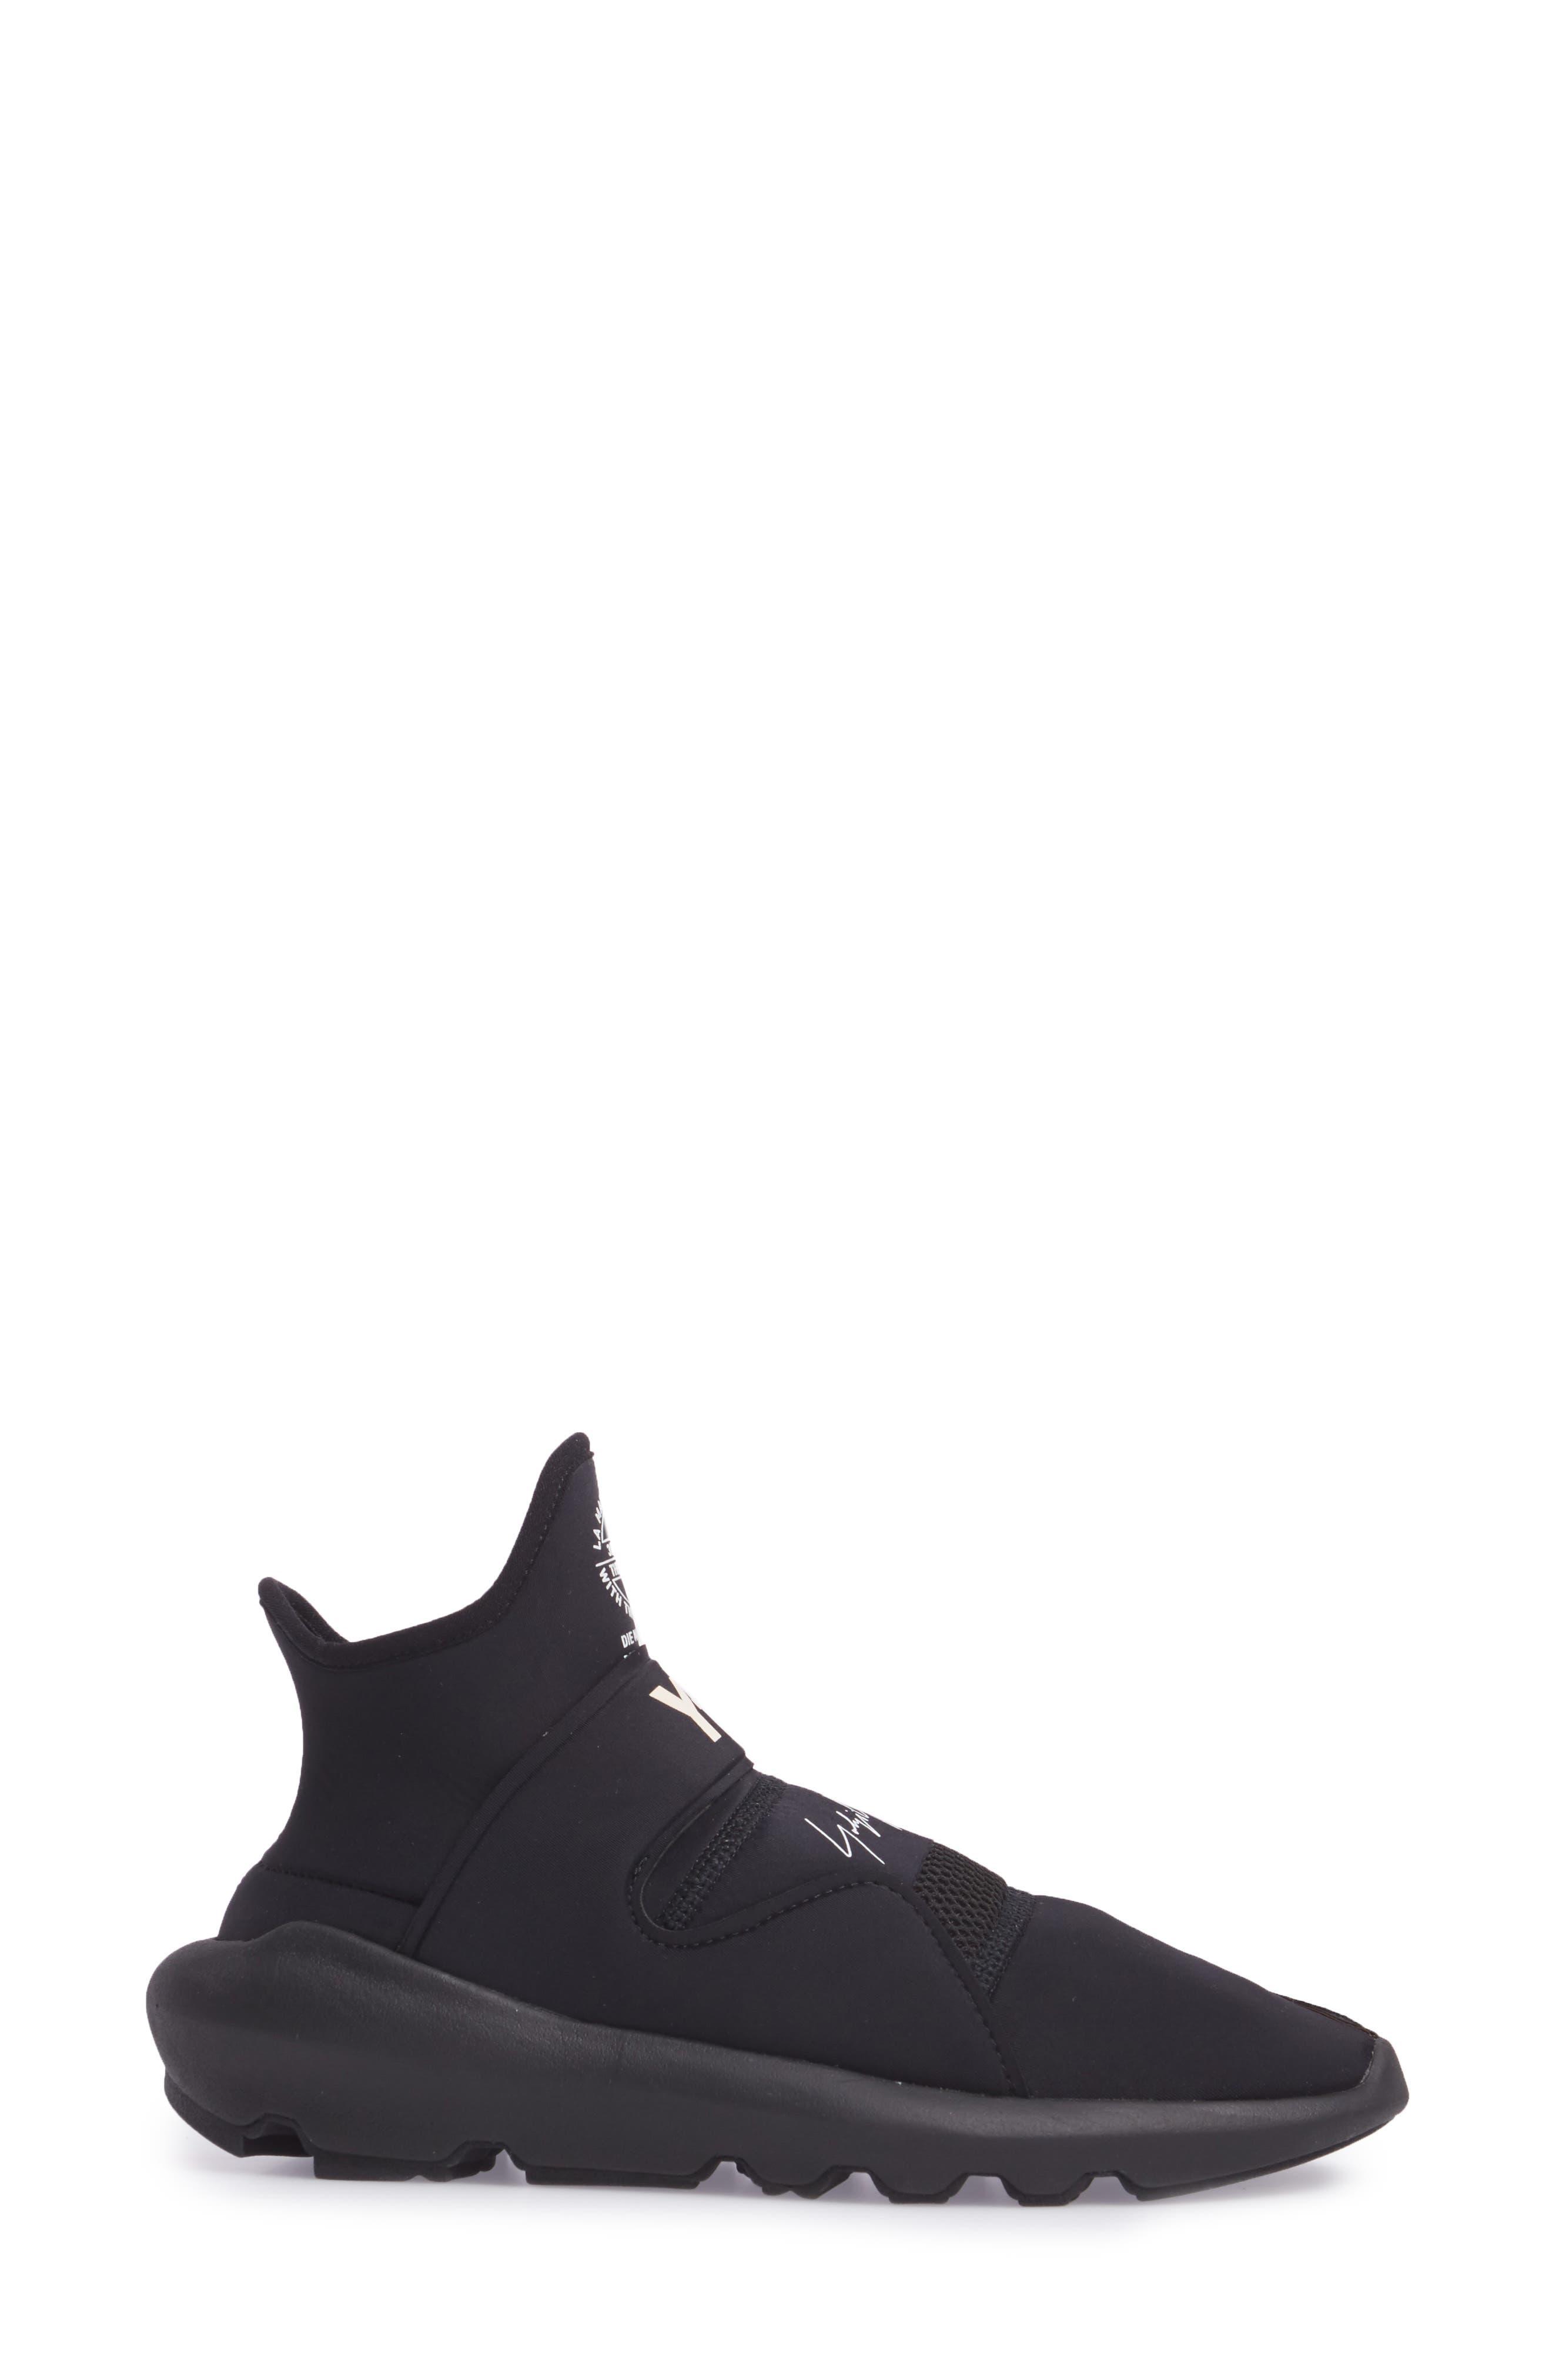 Superbou Sneaker,                             Alternate thumbnail 5, color,